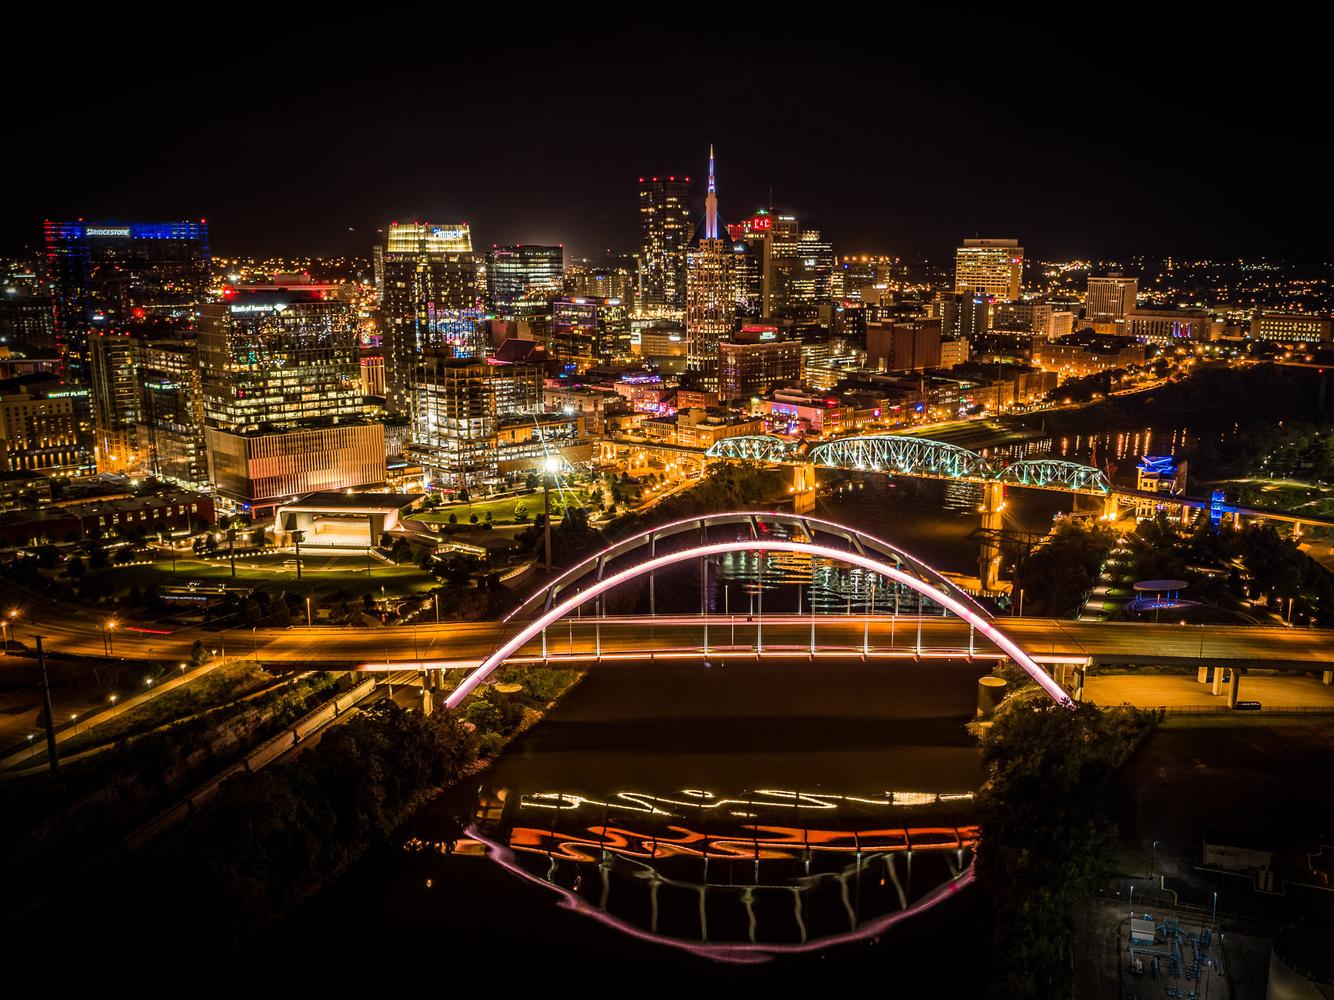 Nashville: Korean Veterans Blvd Bridge at Night by Andrew Keithly